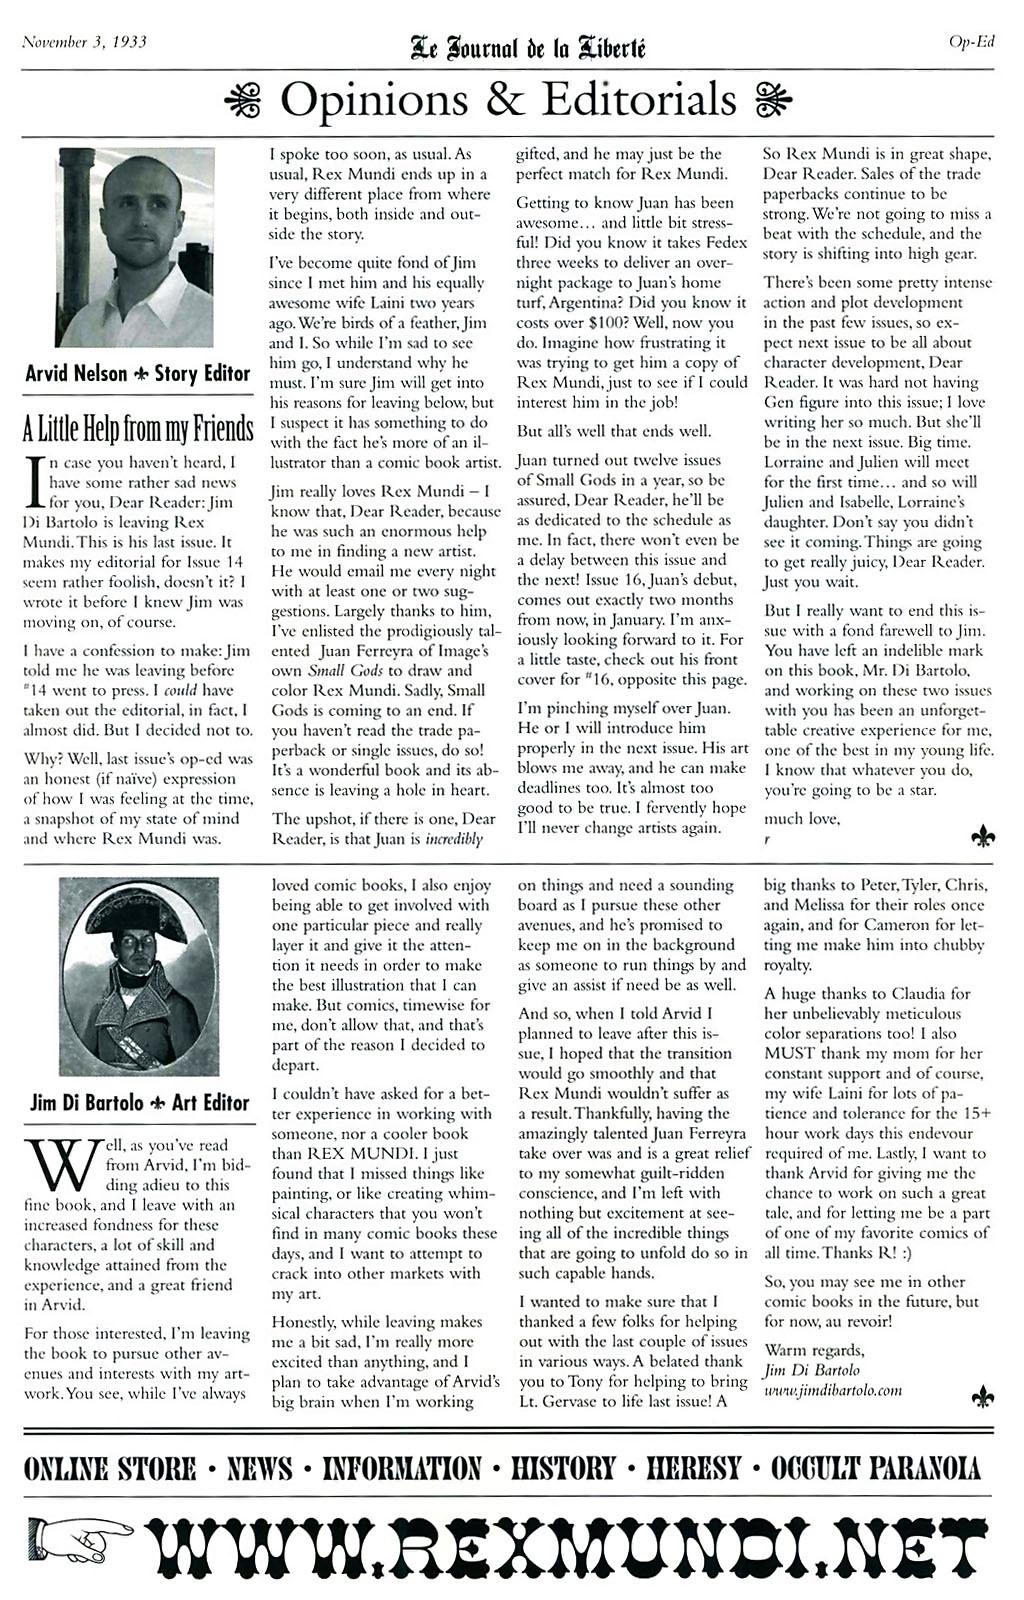 Read online Rex Mundi comic -  Issue #15 - 31